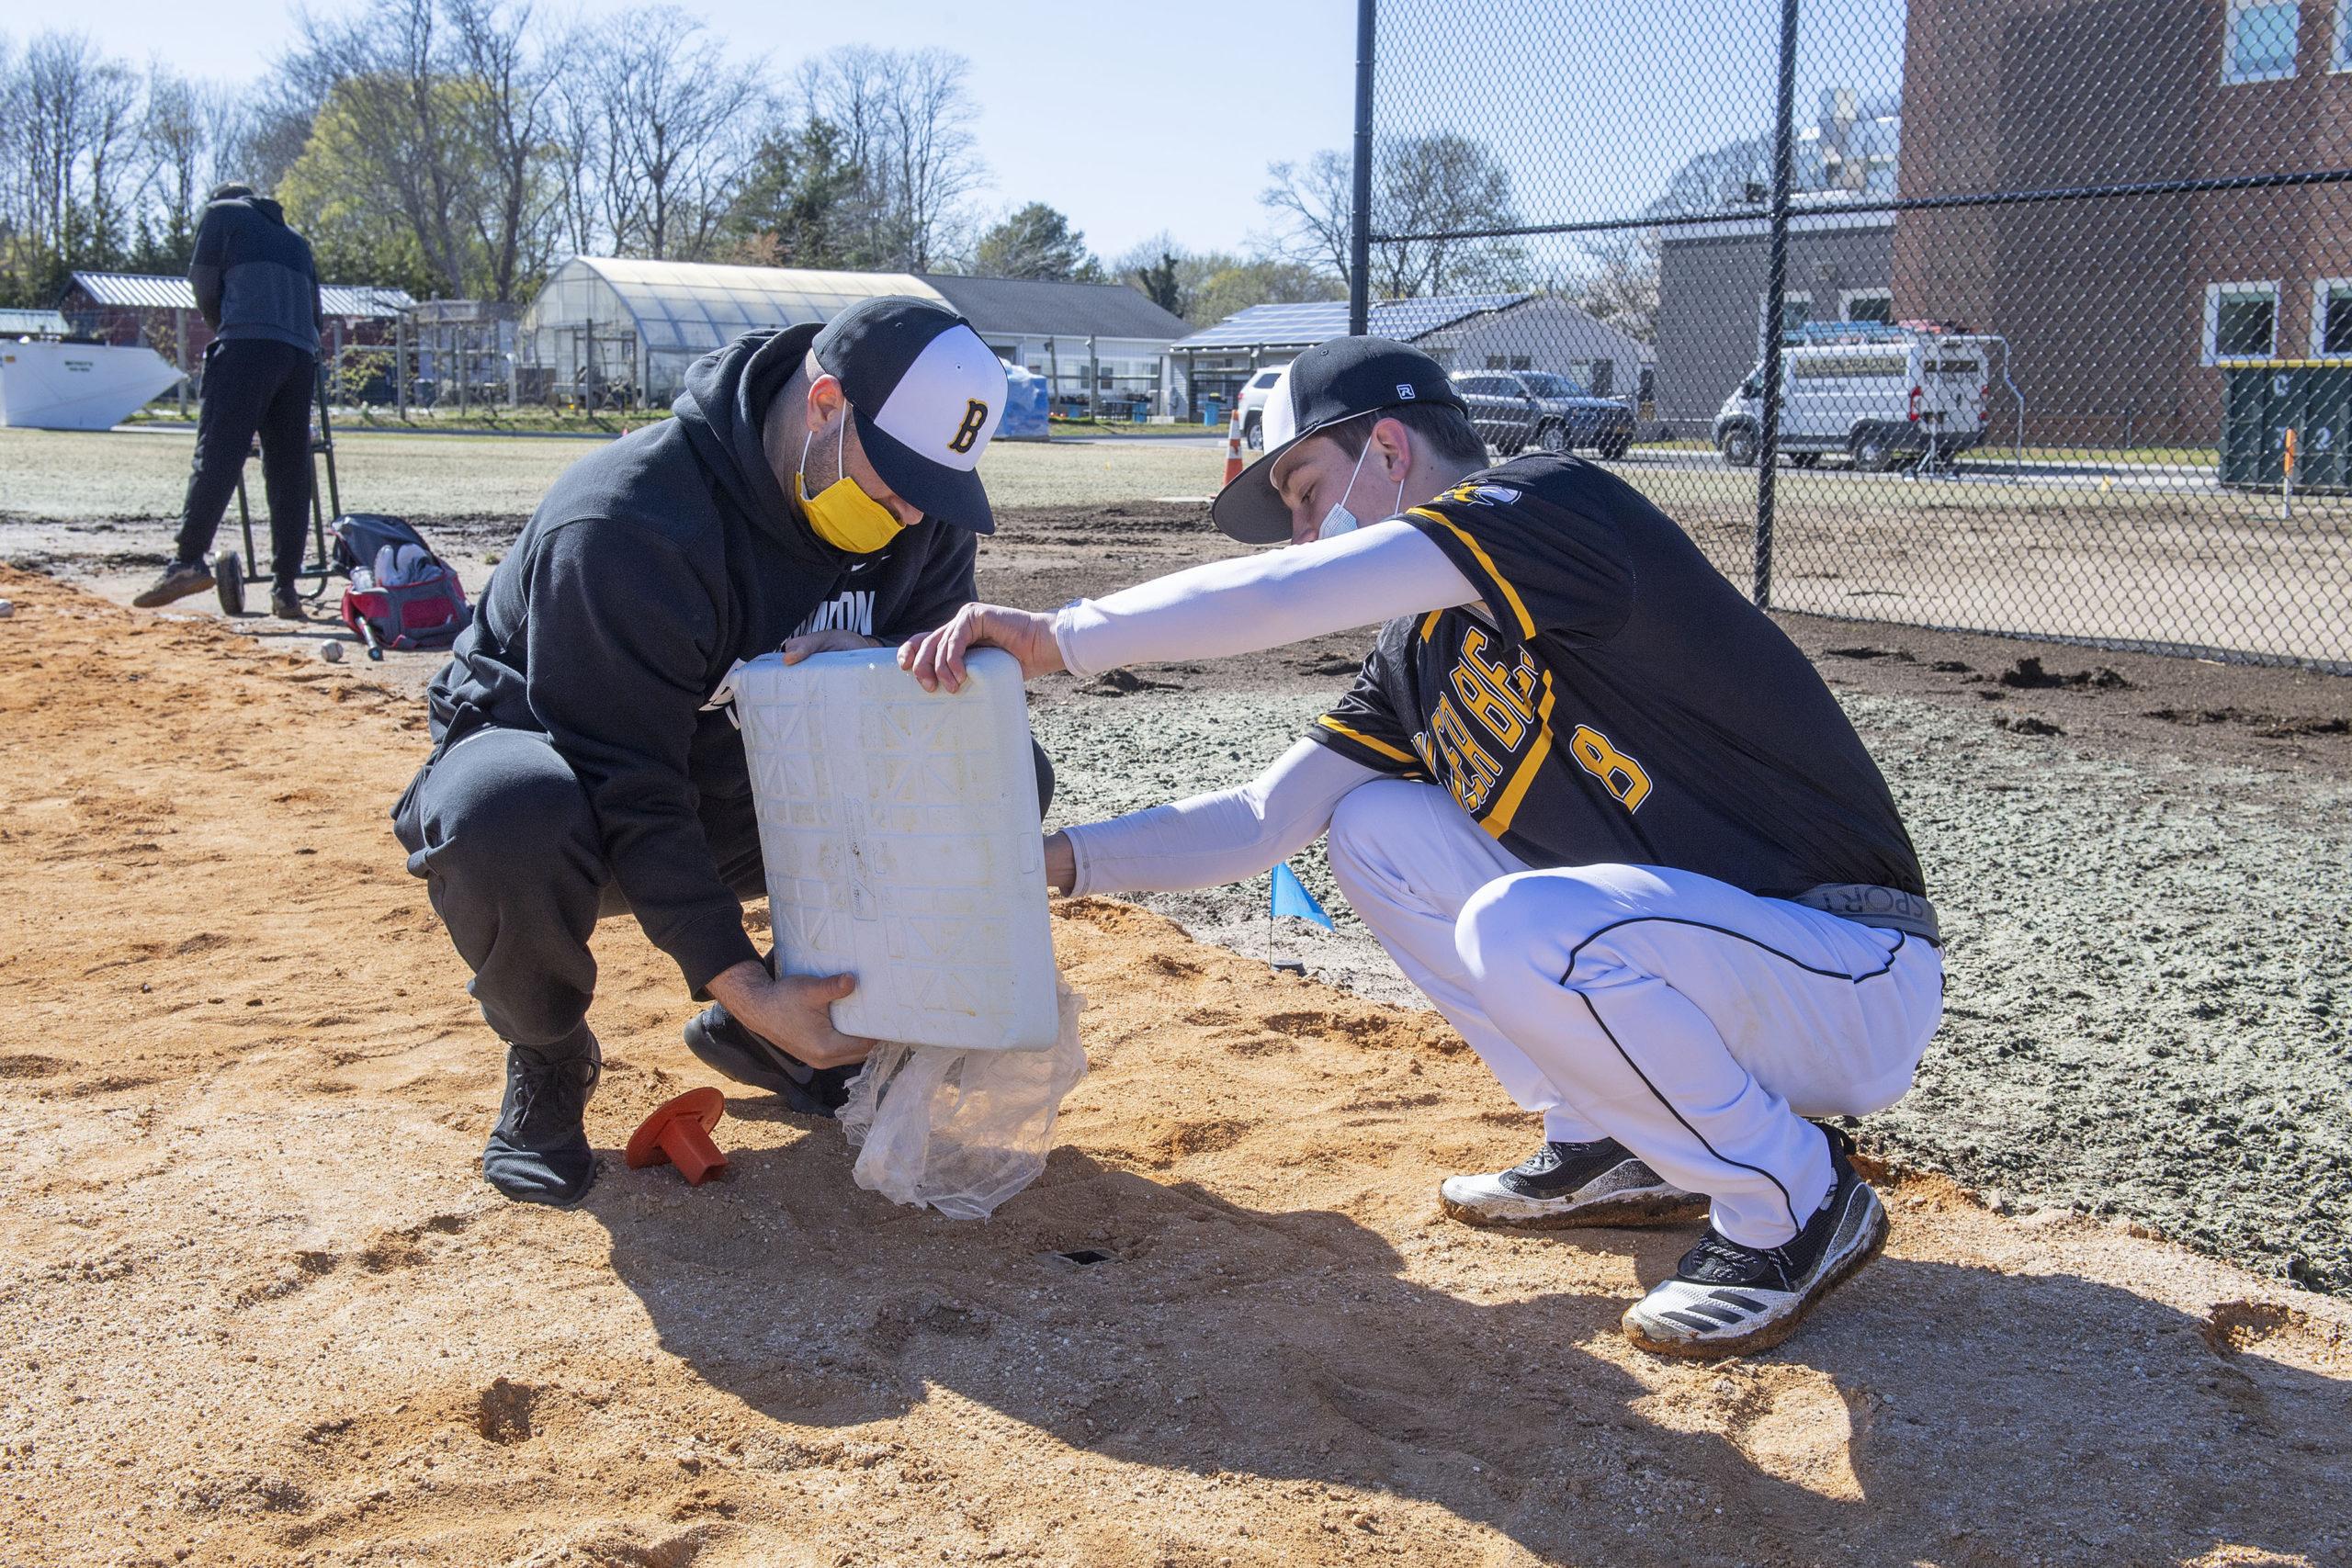 Assistant coach Michael DeRosa, left, and co-captain Scott Vinski set the bases as the Bridgehampton baseball team prepares for its first practice of the season. MICHAEL HELLER